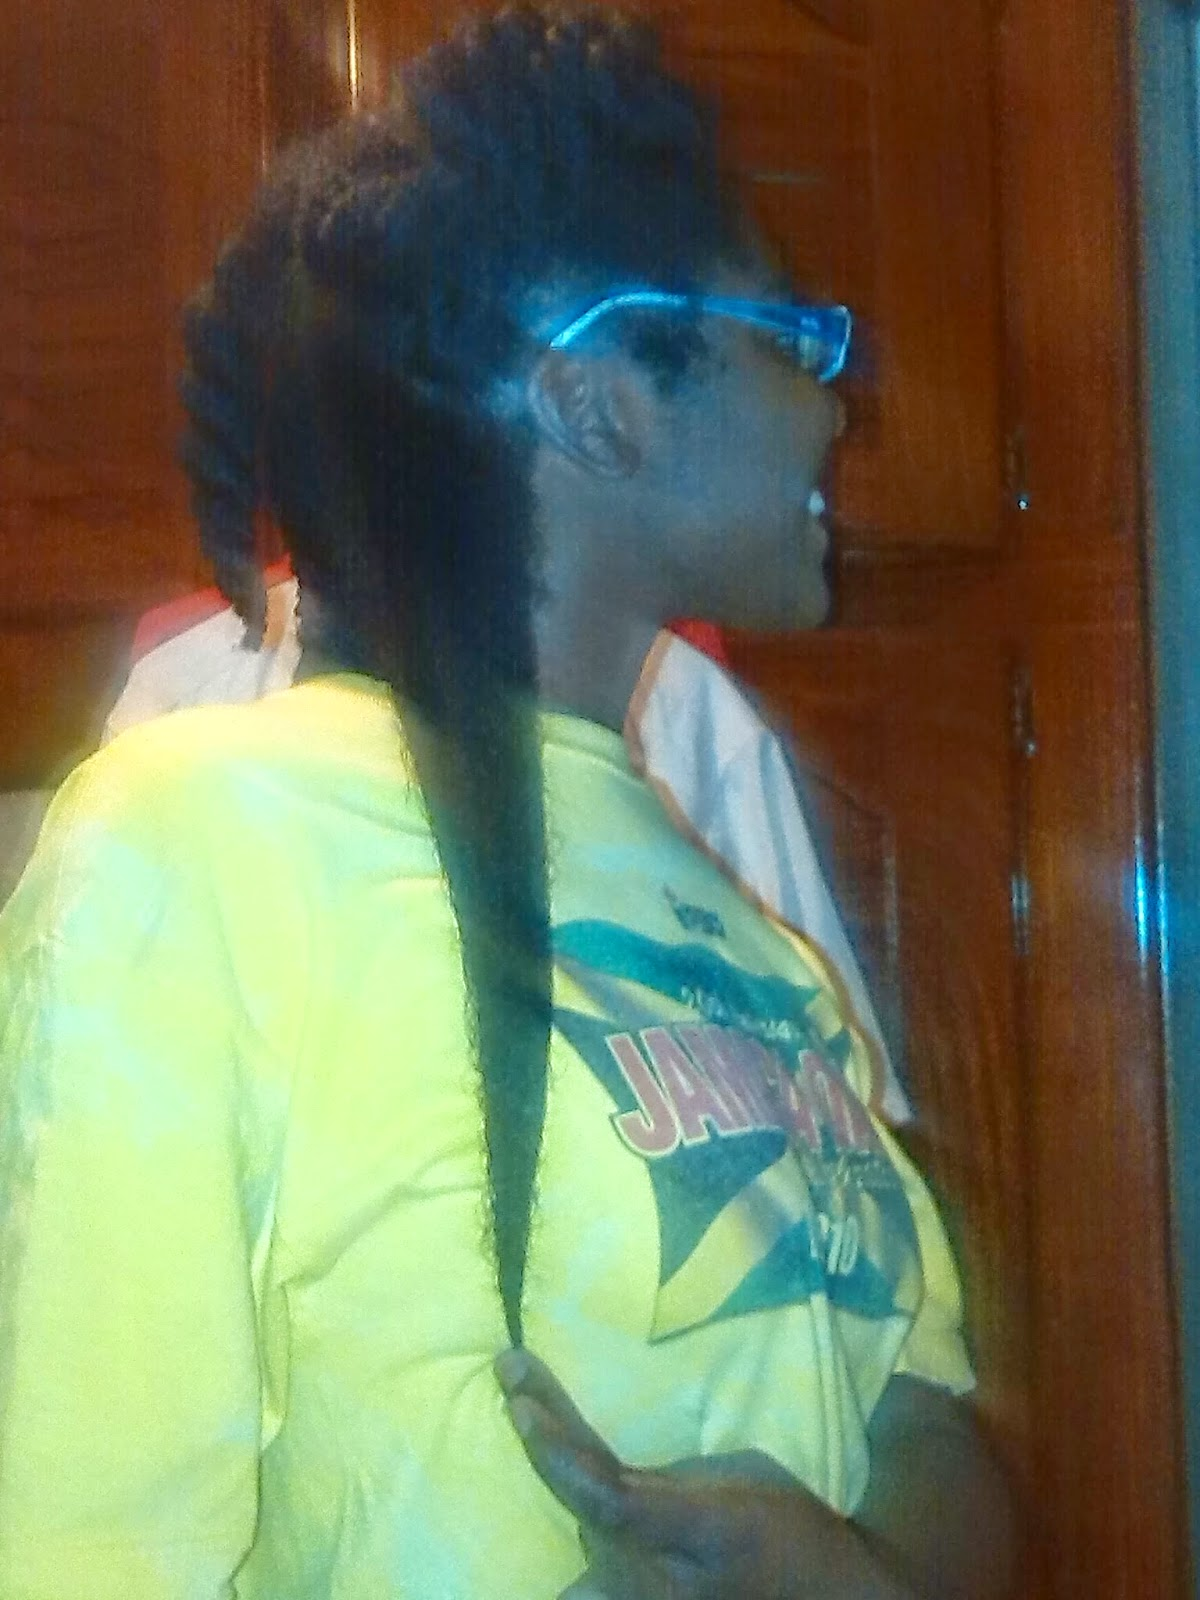 natural hair, long natural hair, afro hair, afro puff, jamaican naturals, caribbean naturals, waist length natural hair, Kreamy Kurls, natural hair blogger, long black hair,natural hair journey, long term transitioner, transitioning hair